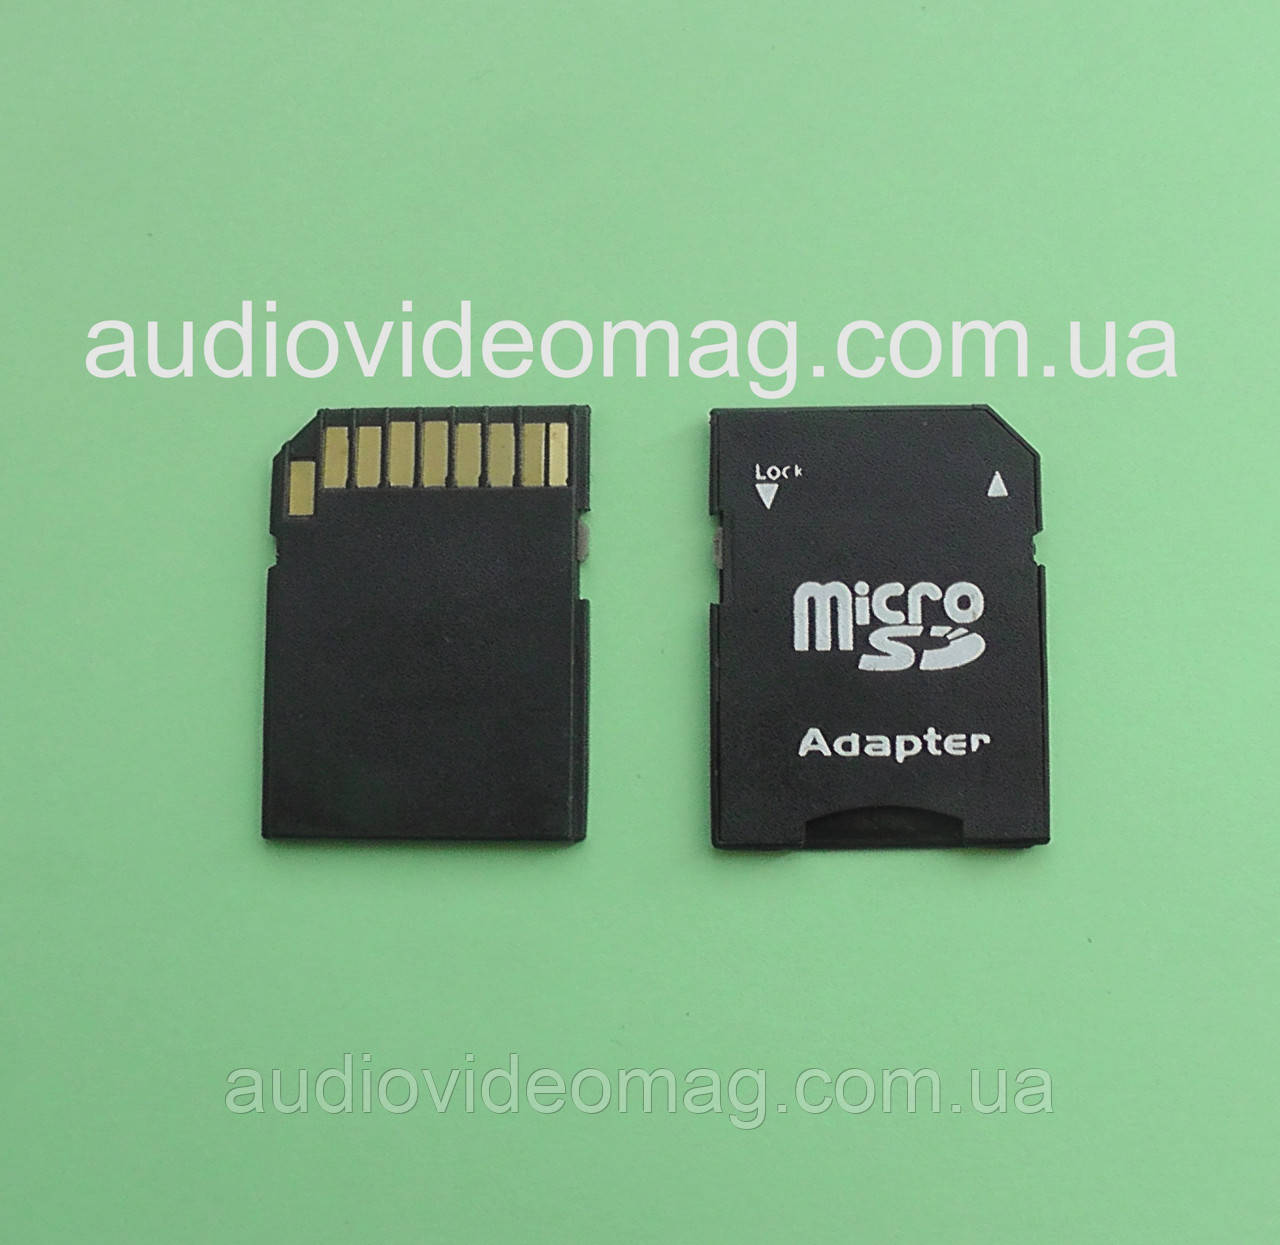 Адаптер-переходник с карты памяти micro SD на SD